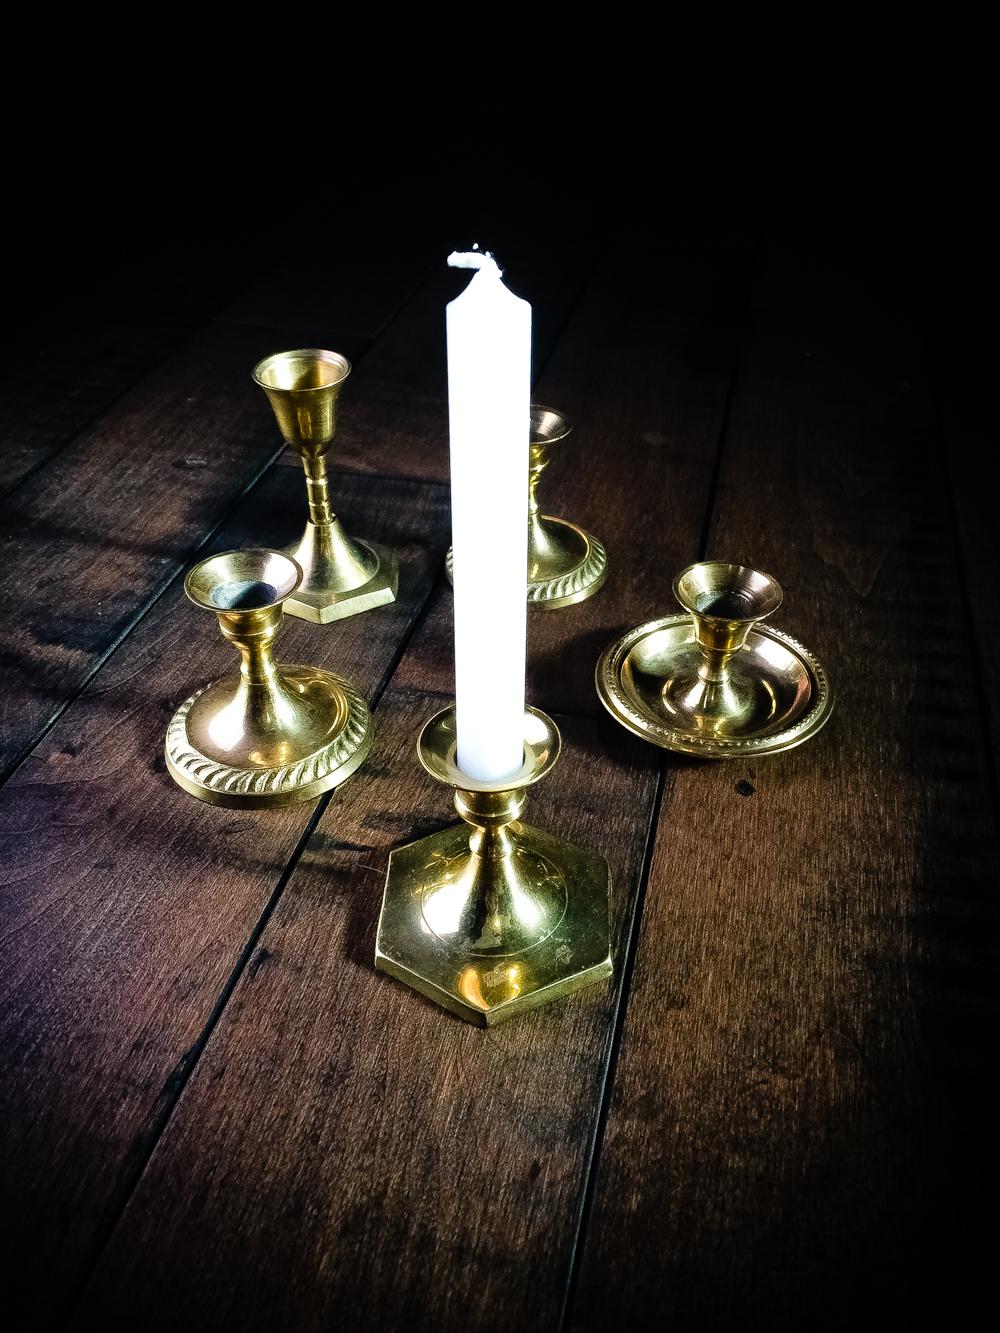 Chime Candle Holder / Spell Candle Holder / Altar Candle Holder